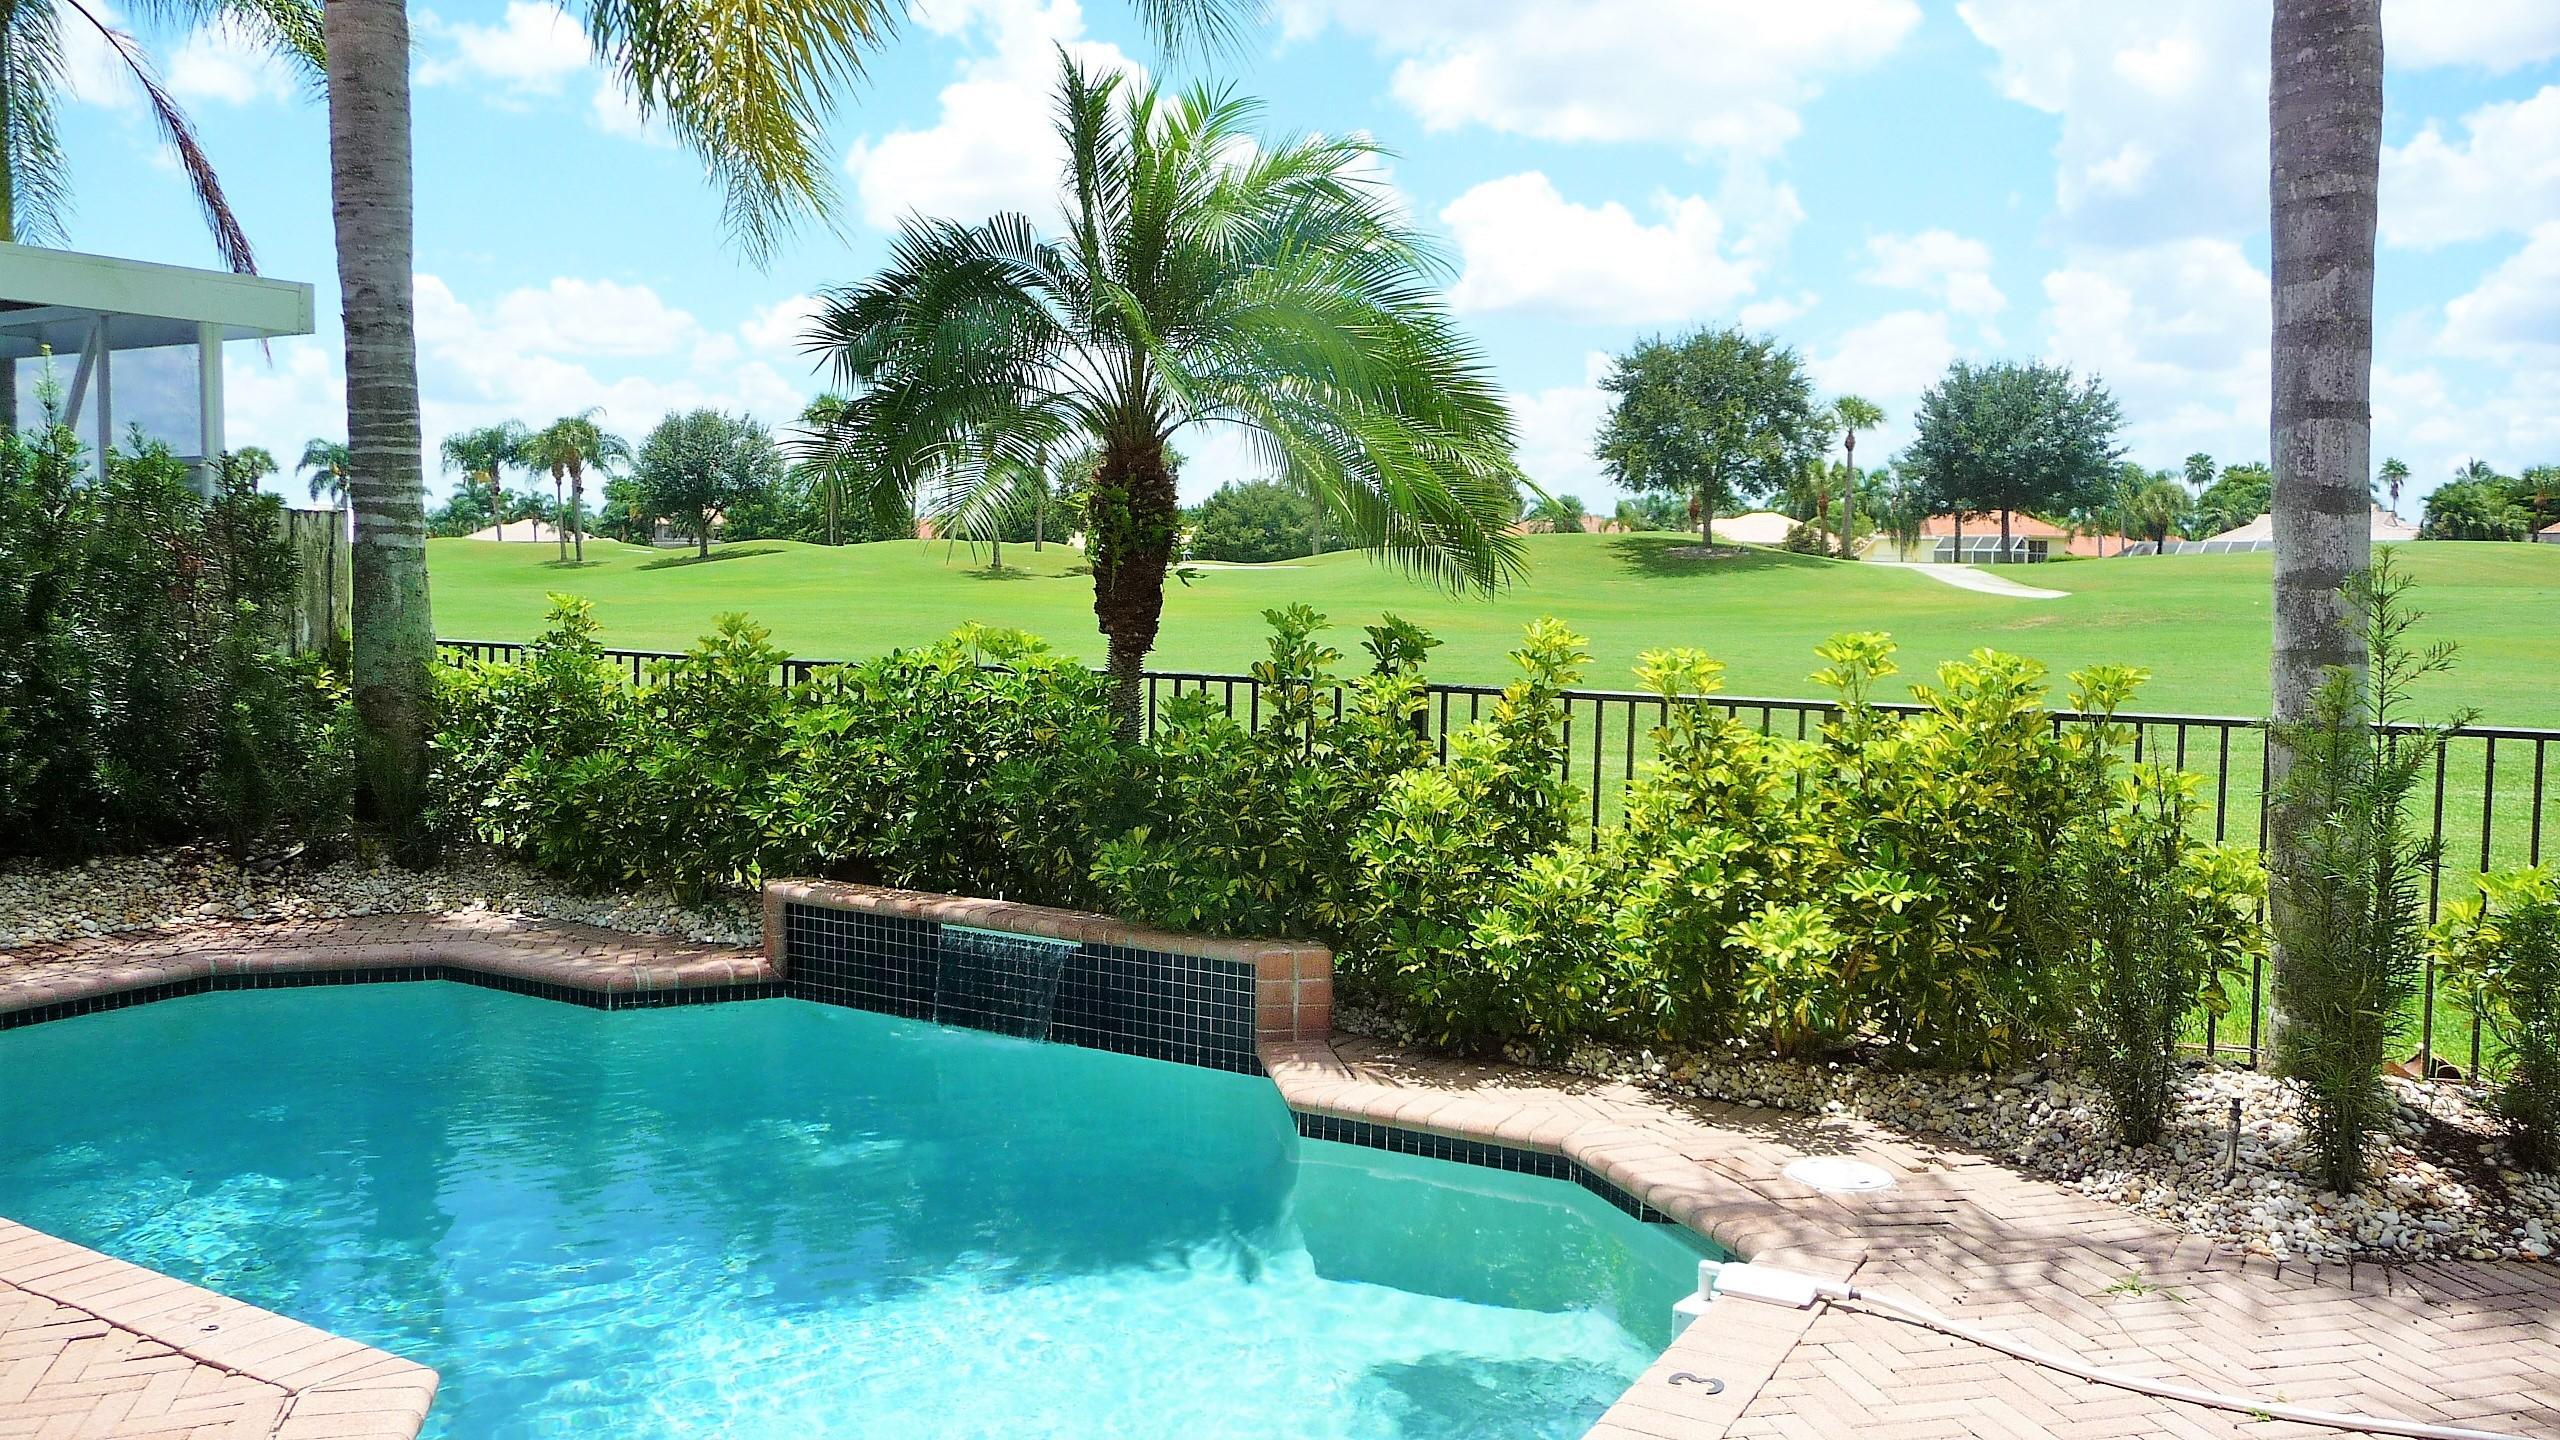 8477 Legend Club Drive West Palm Beach,Florida 33412,4 Bedrooms Bedrooms,3.1 BathroomsBathrooms,A,Legend Club,RX-10456783